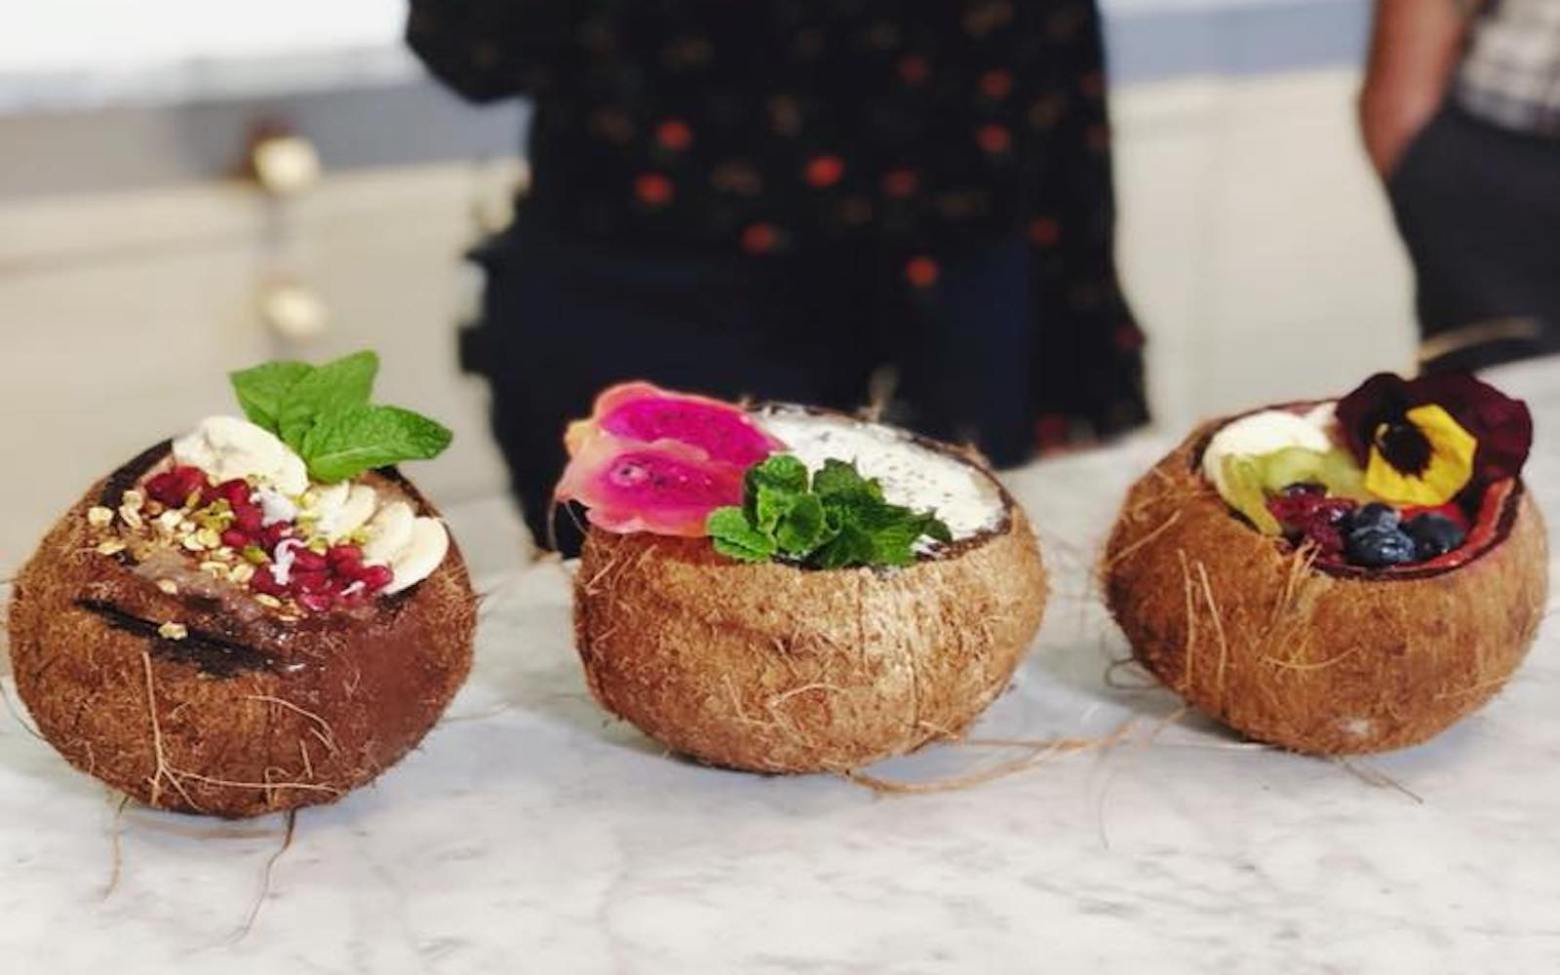 squeezery-austin-coconut-bowls.jpg